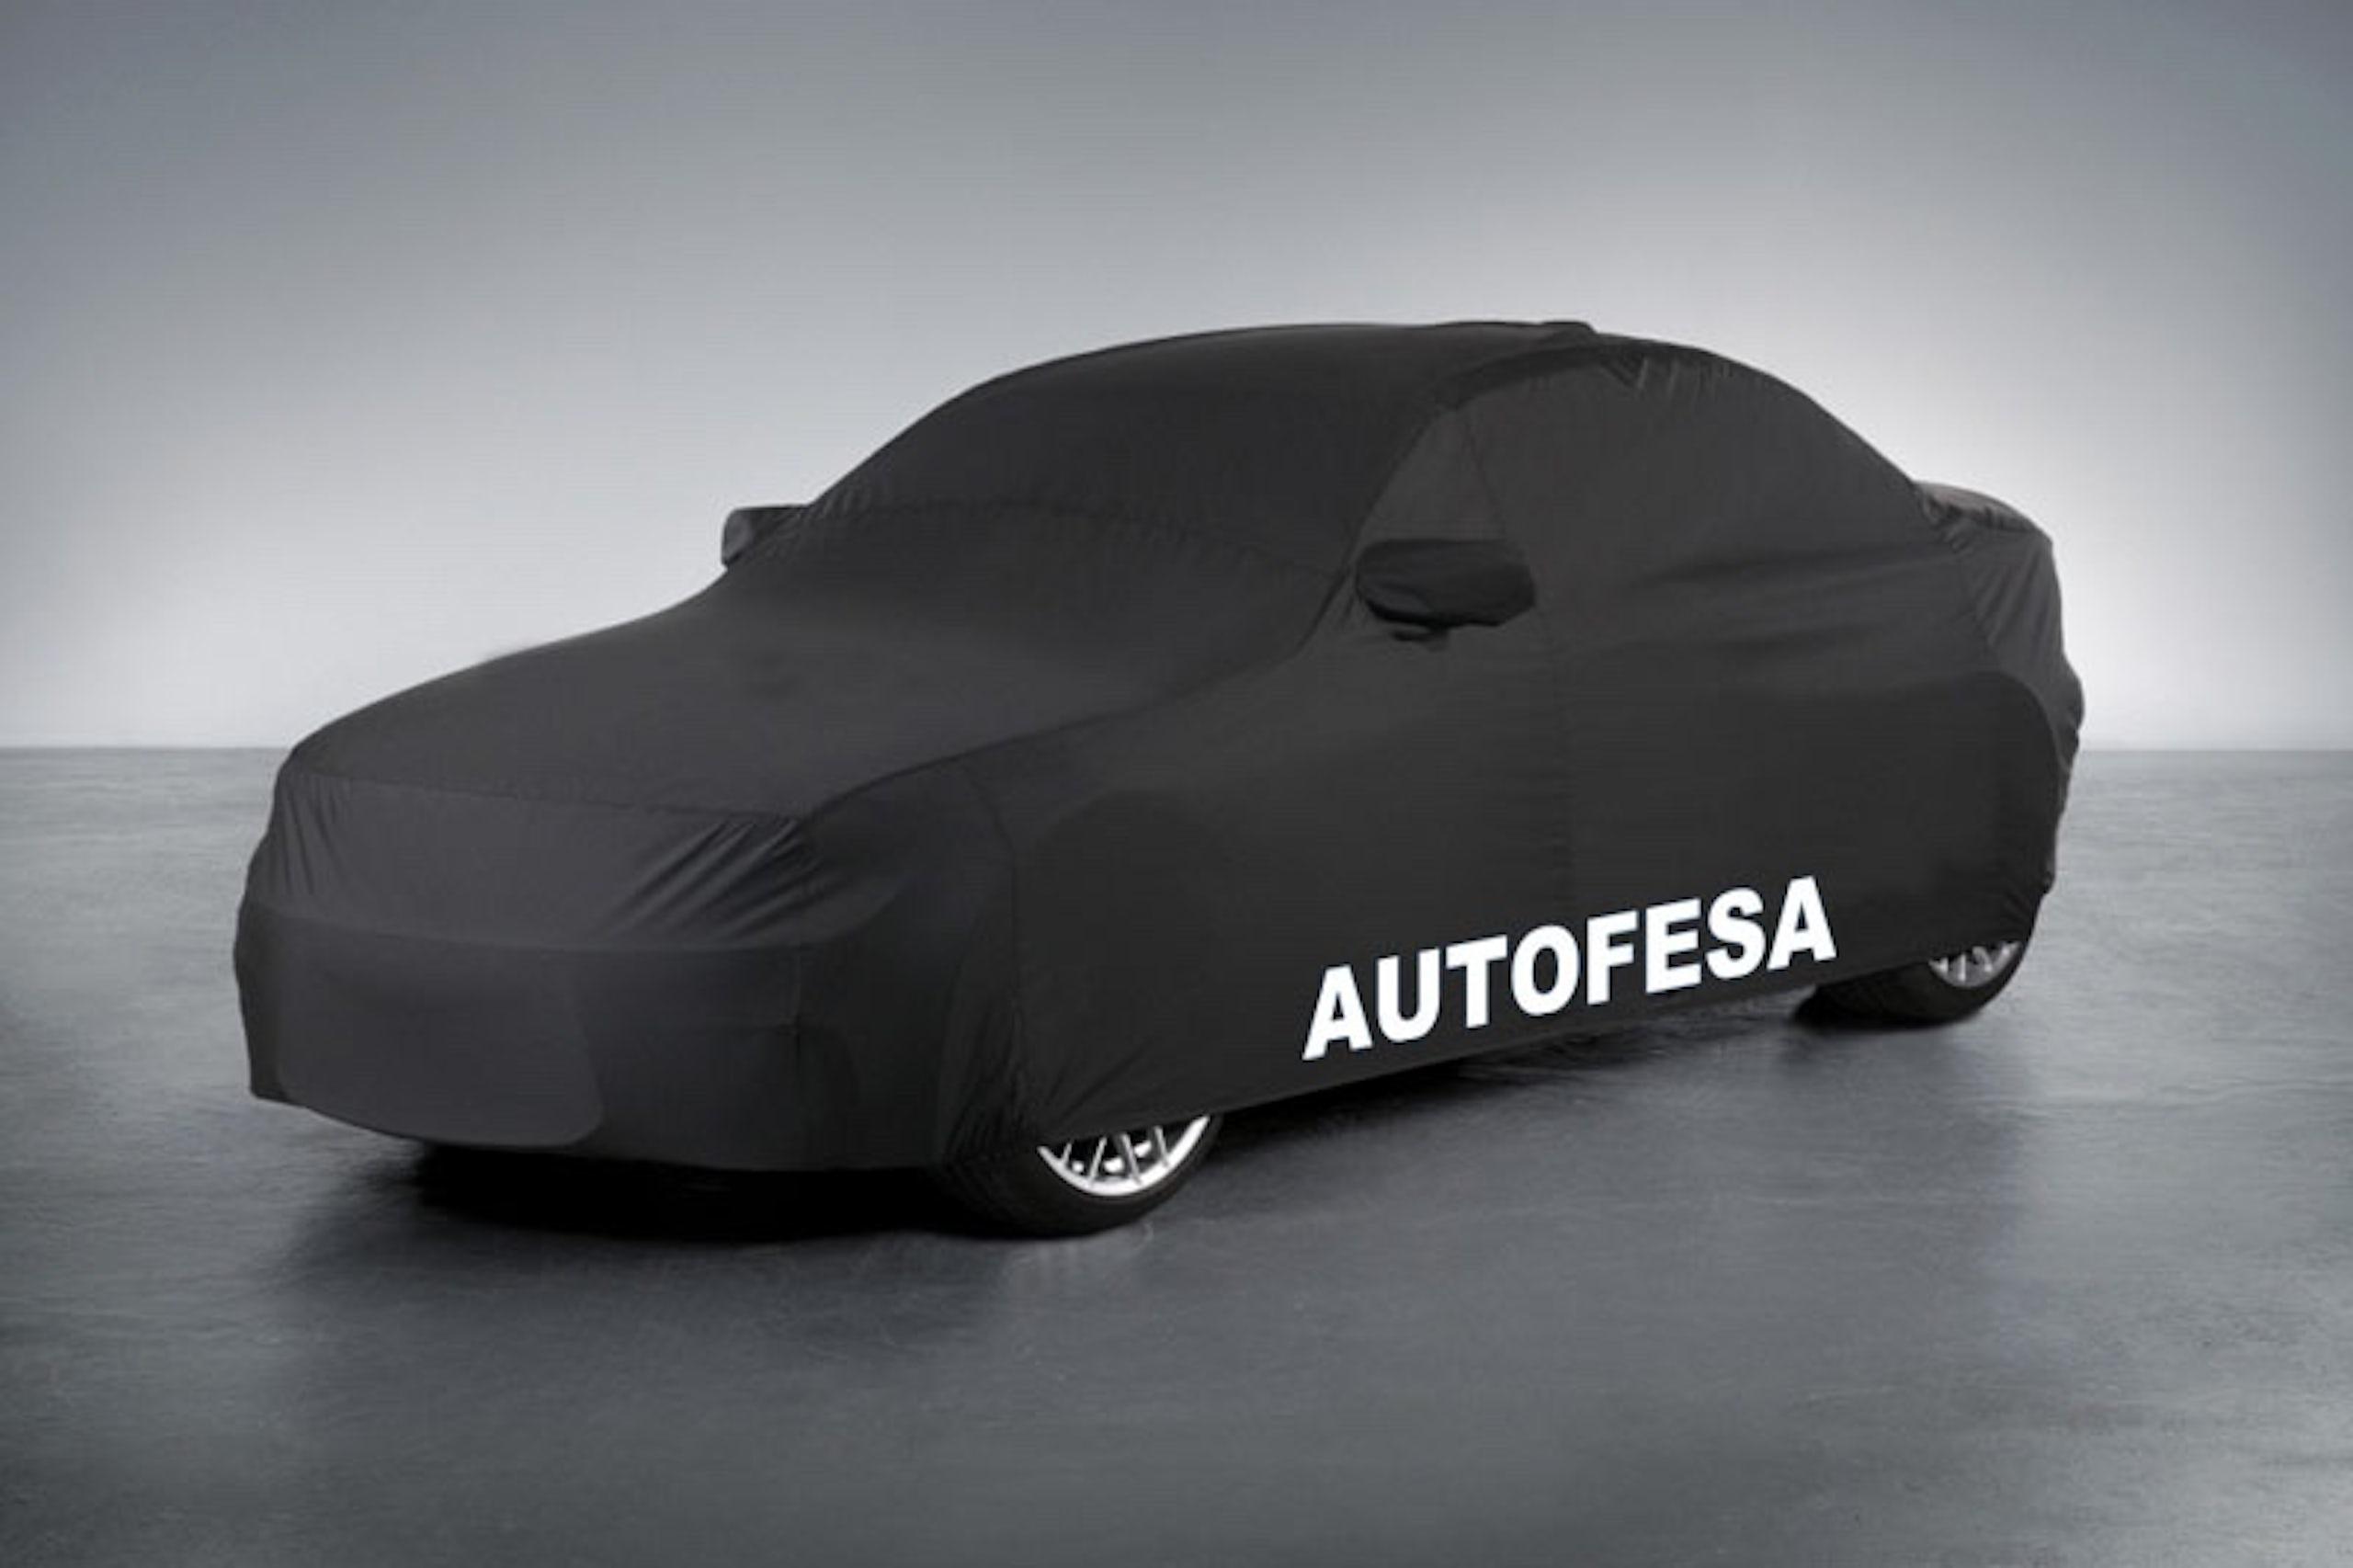 Audi A1 A1 Sportback 1.6 TDI 116cv Adrenalin Sline 5p